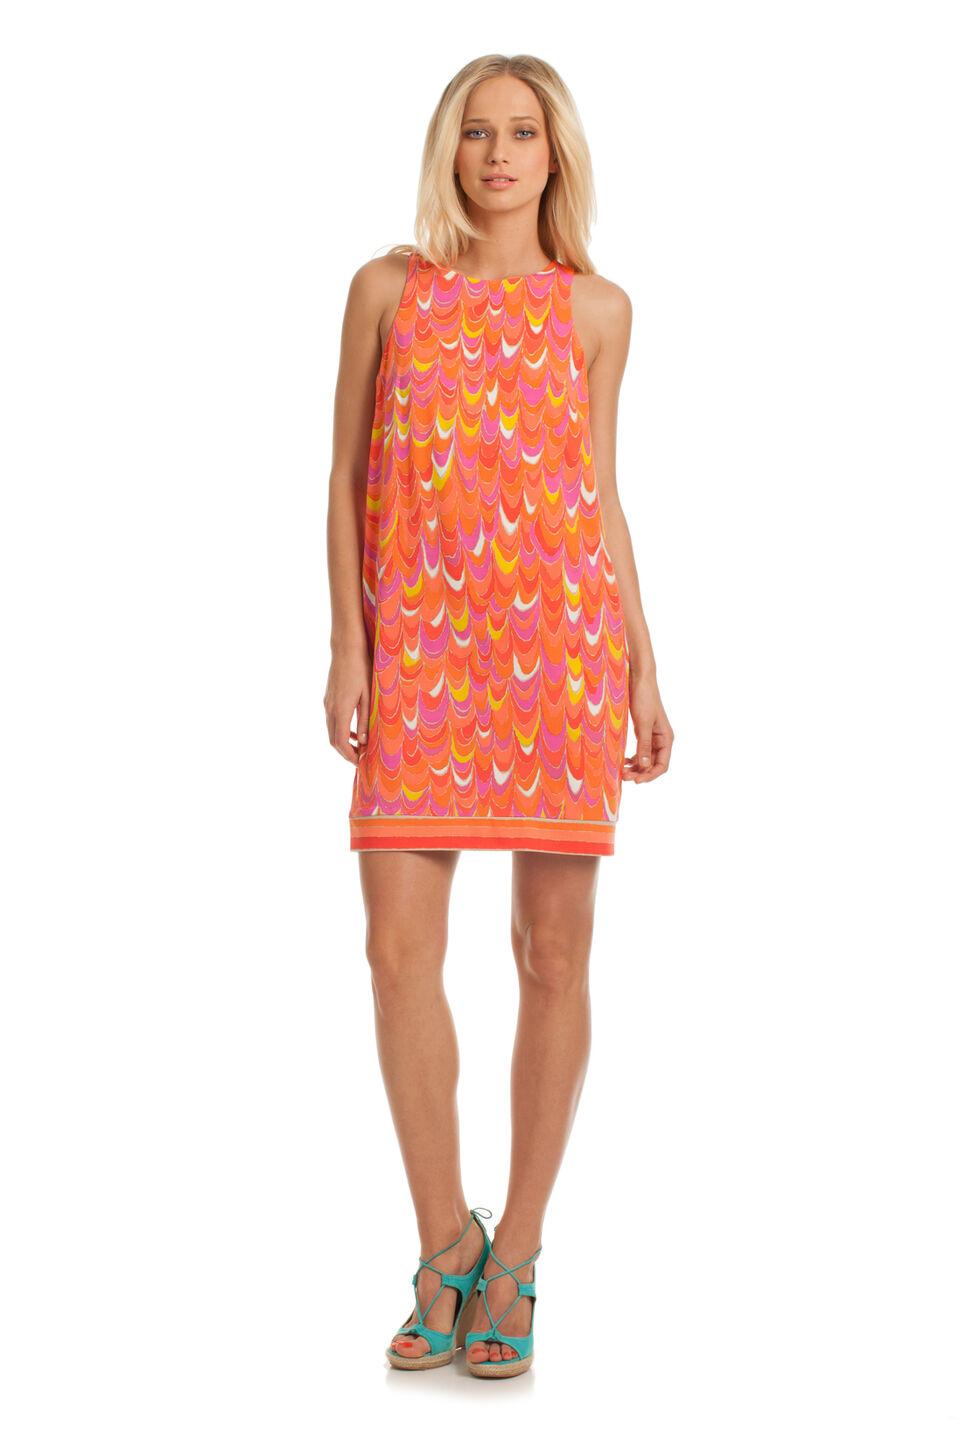 Macee 2 Dress